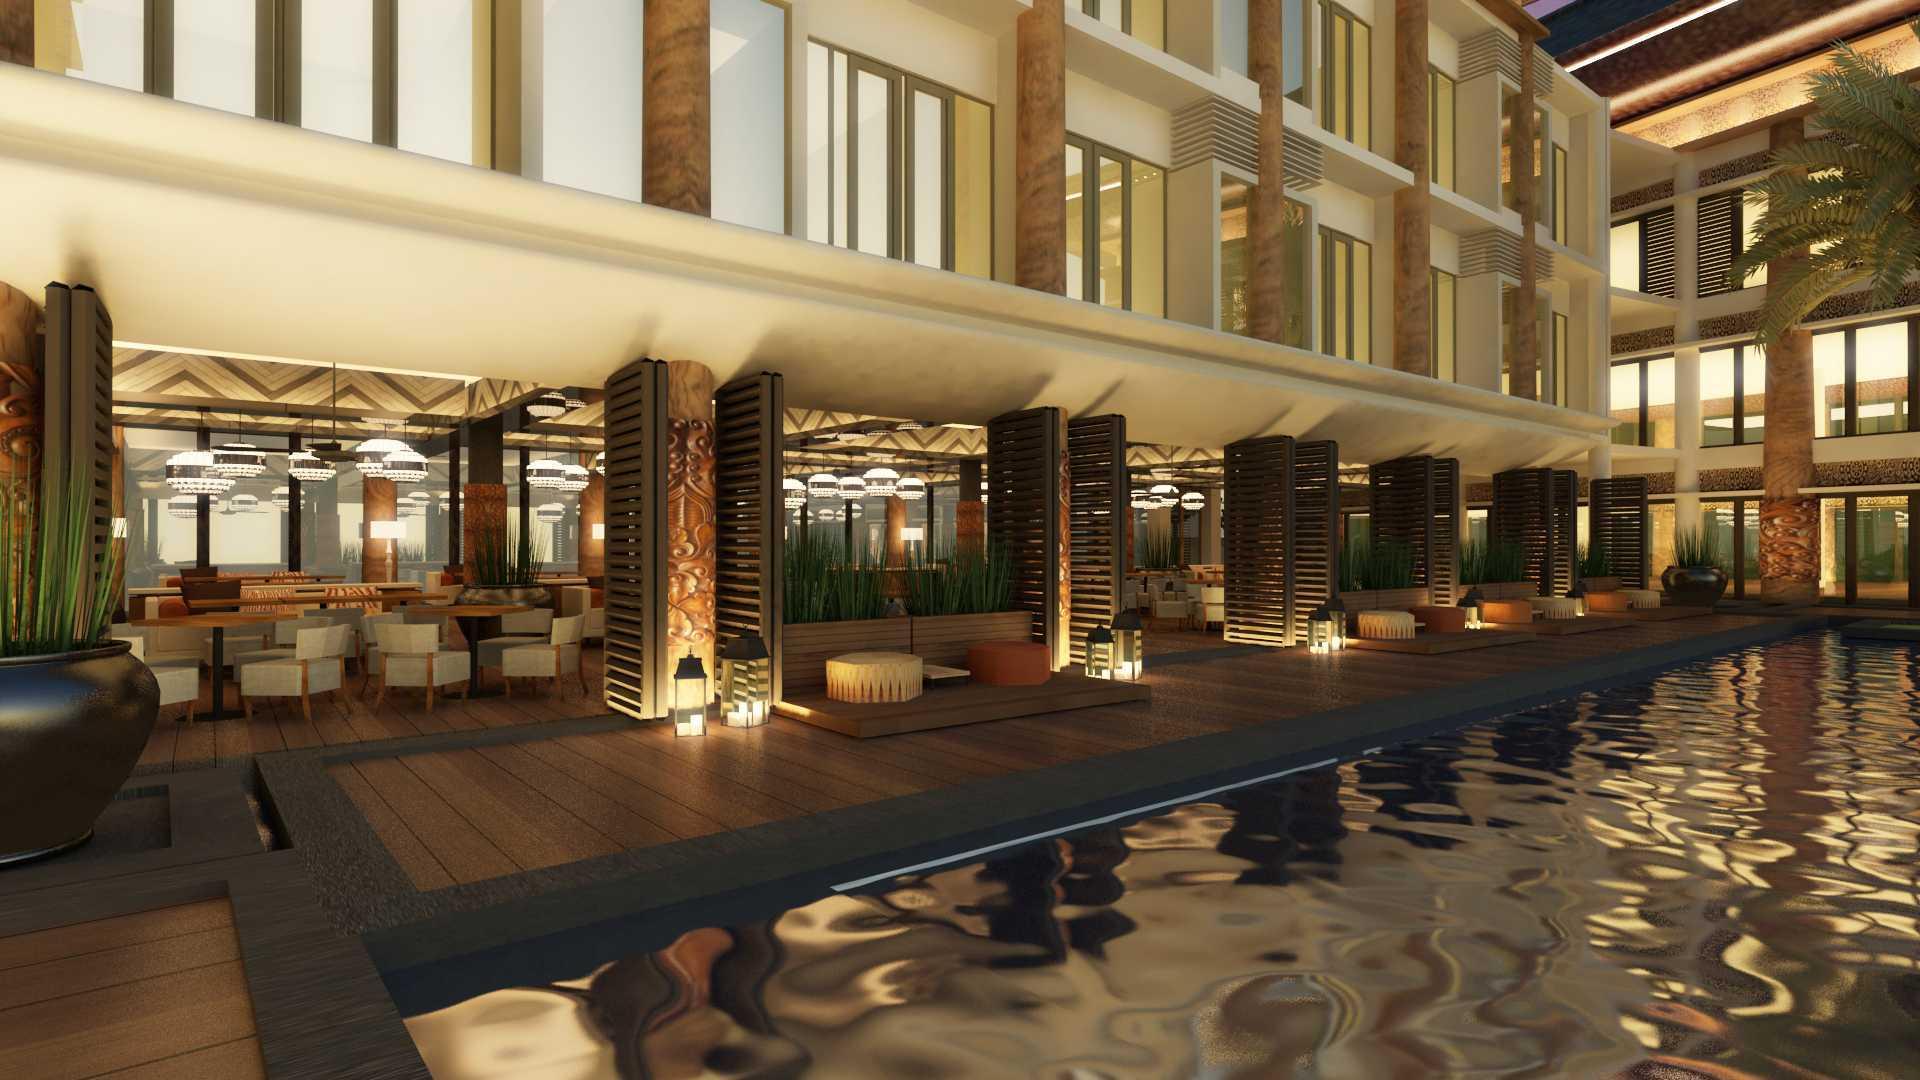 Vin•da•te Hotel Ubud Bali Ubud-Bali Ubud-Bali Swimming Pool Area Modern  18917